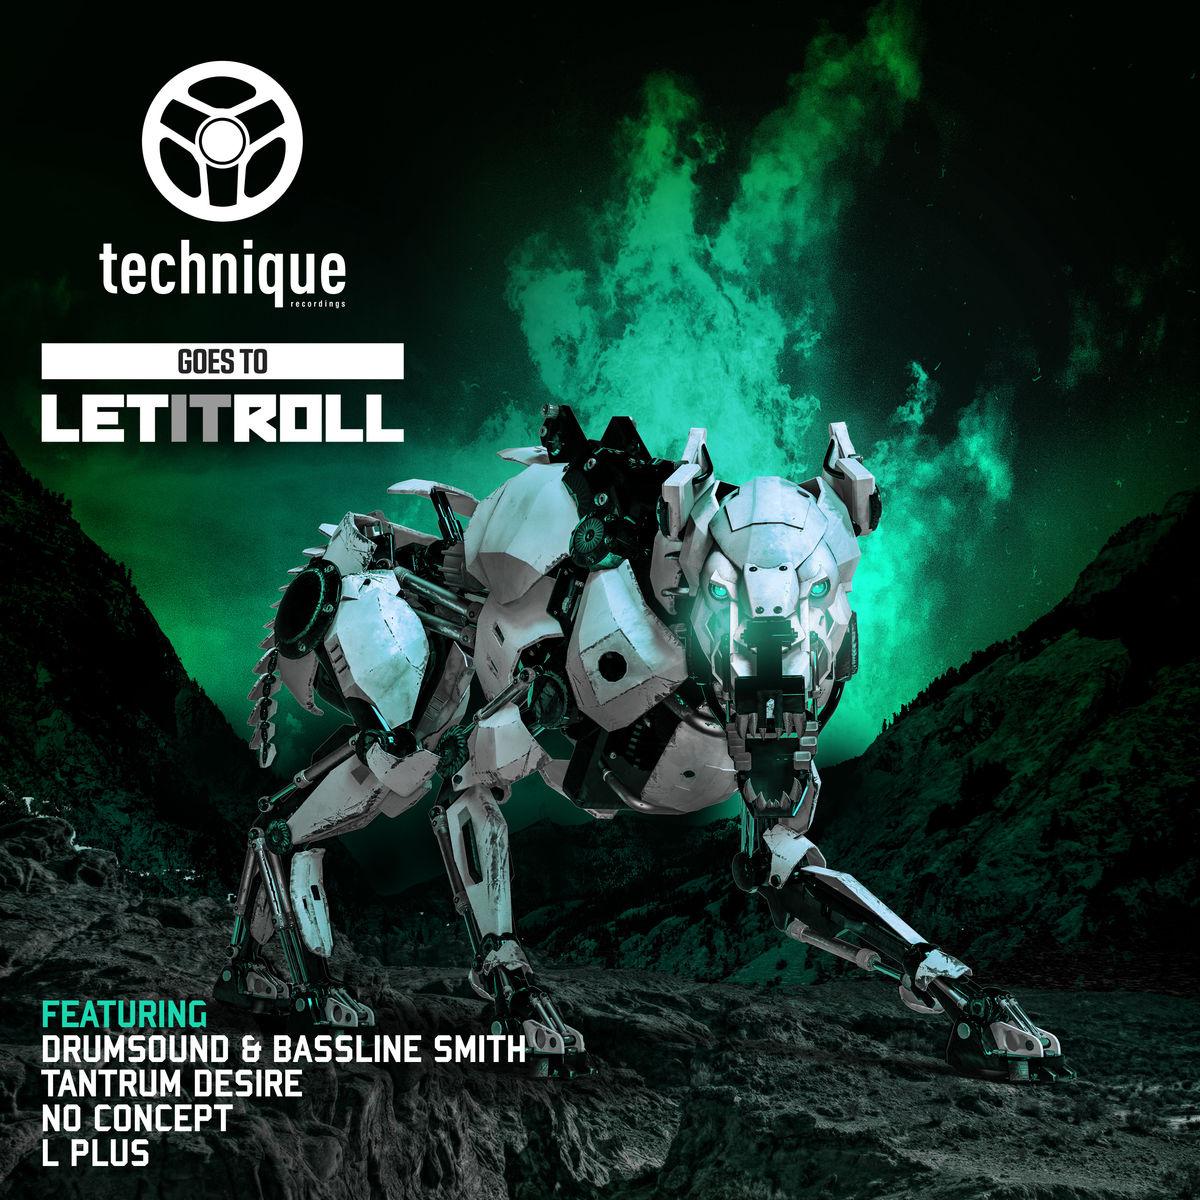 Drumsound & Bassline Smith - Control  (Let It Roll VIP)